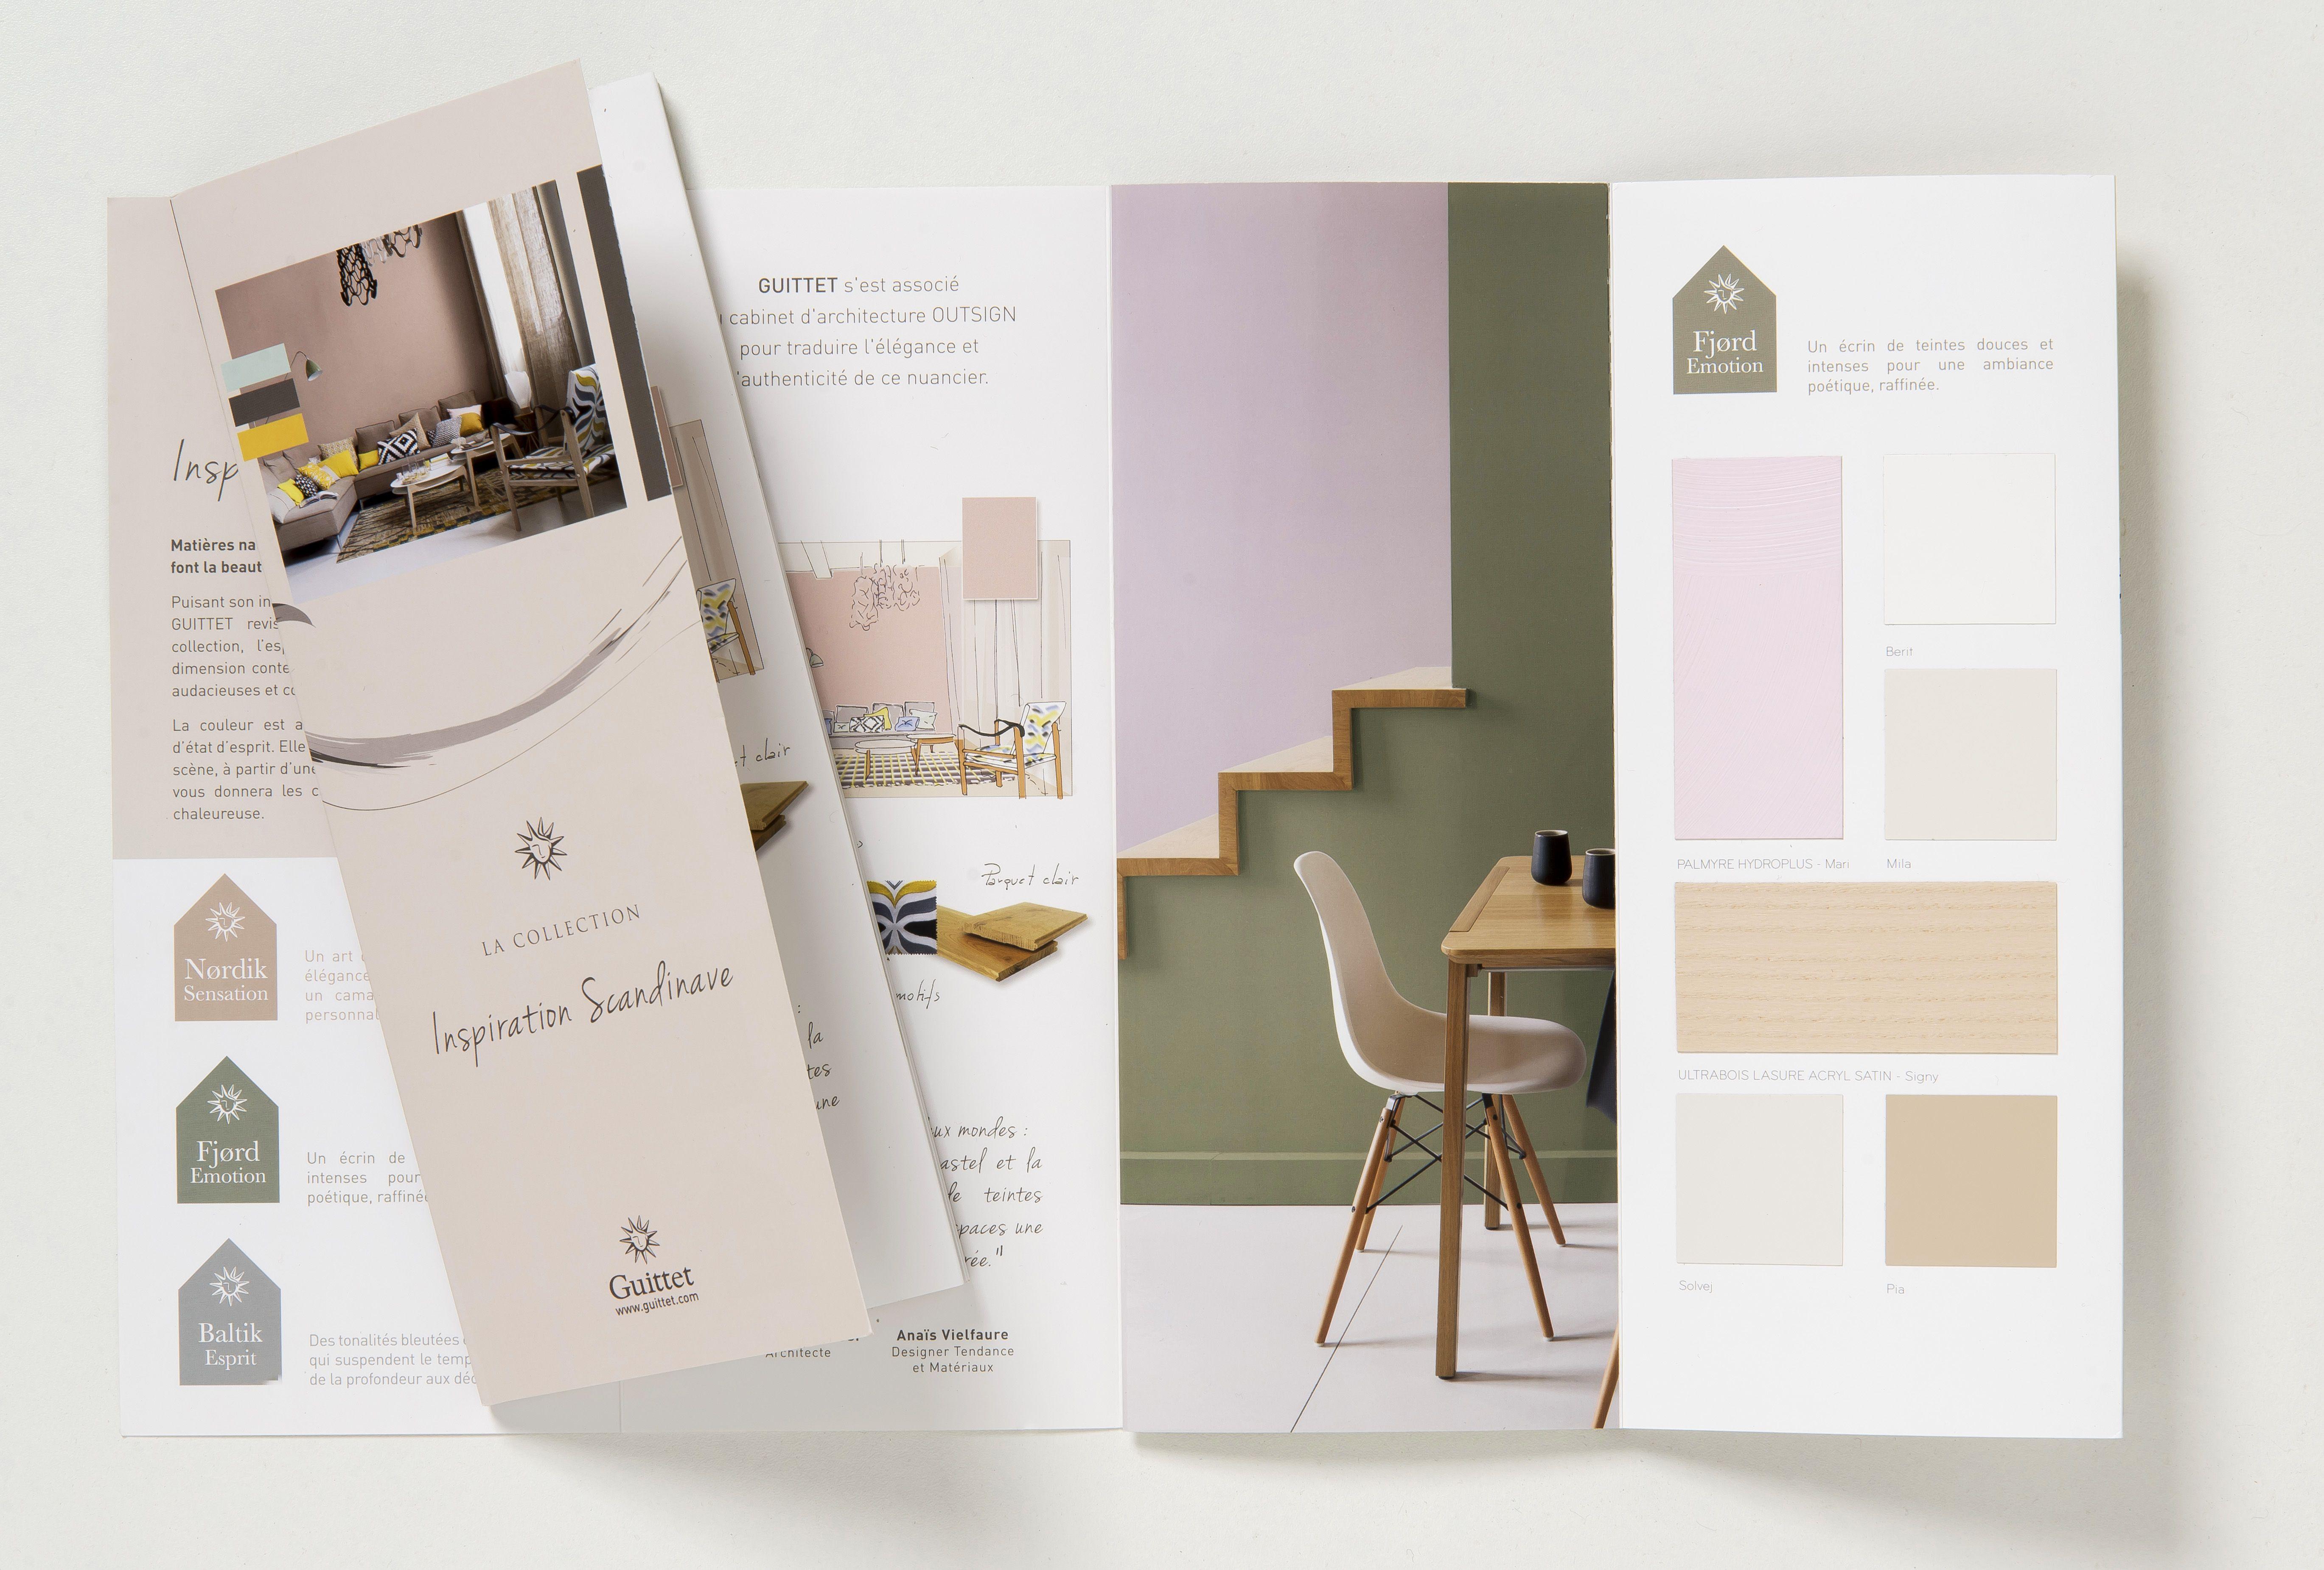 nuancier collection inspiration scandinave de guittet une. Black Bedroom Furniture Sets. Home Design Ideas